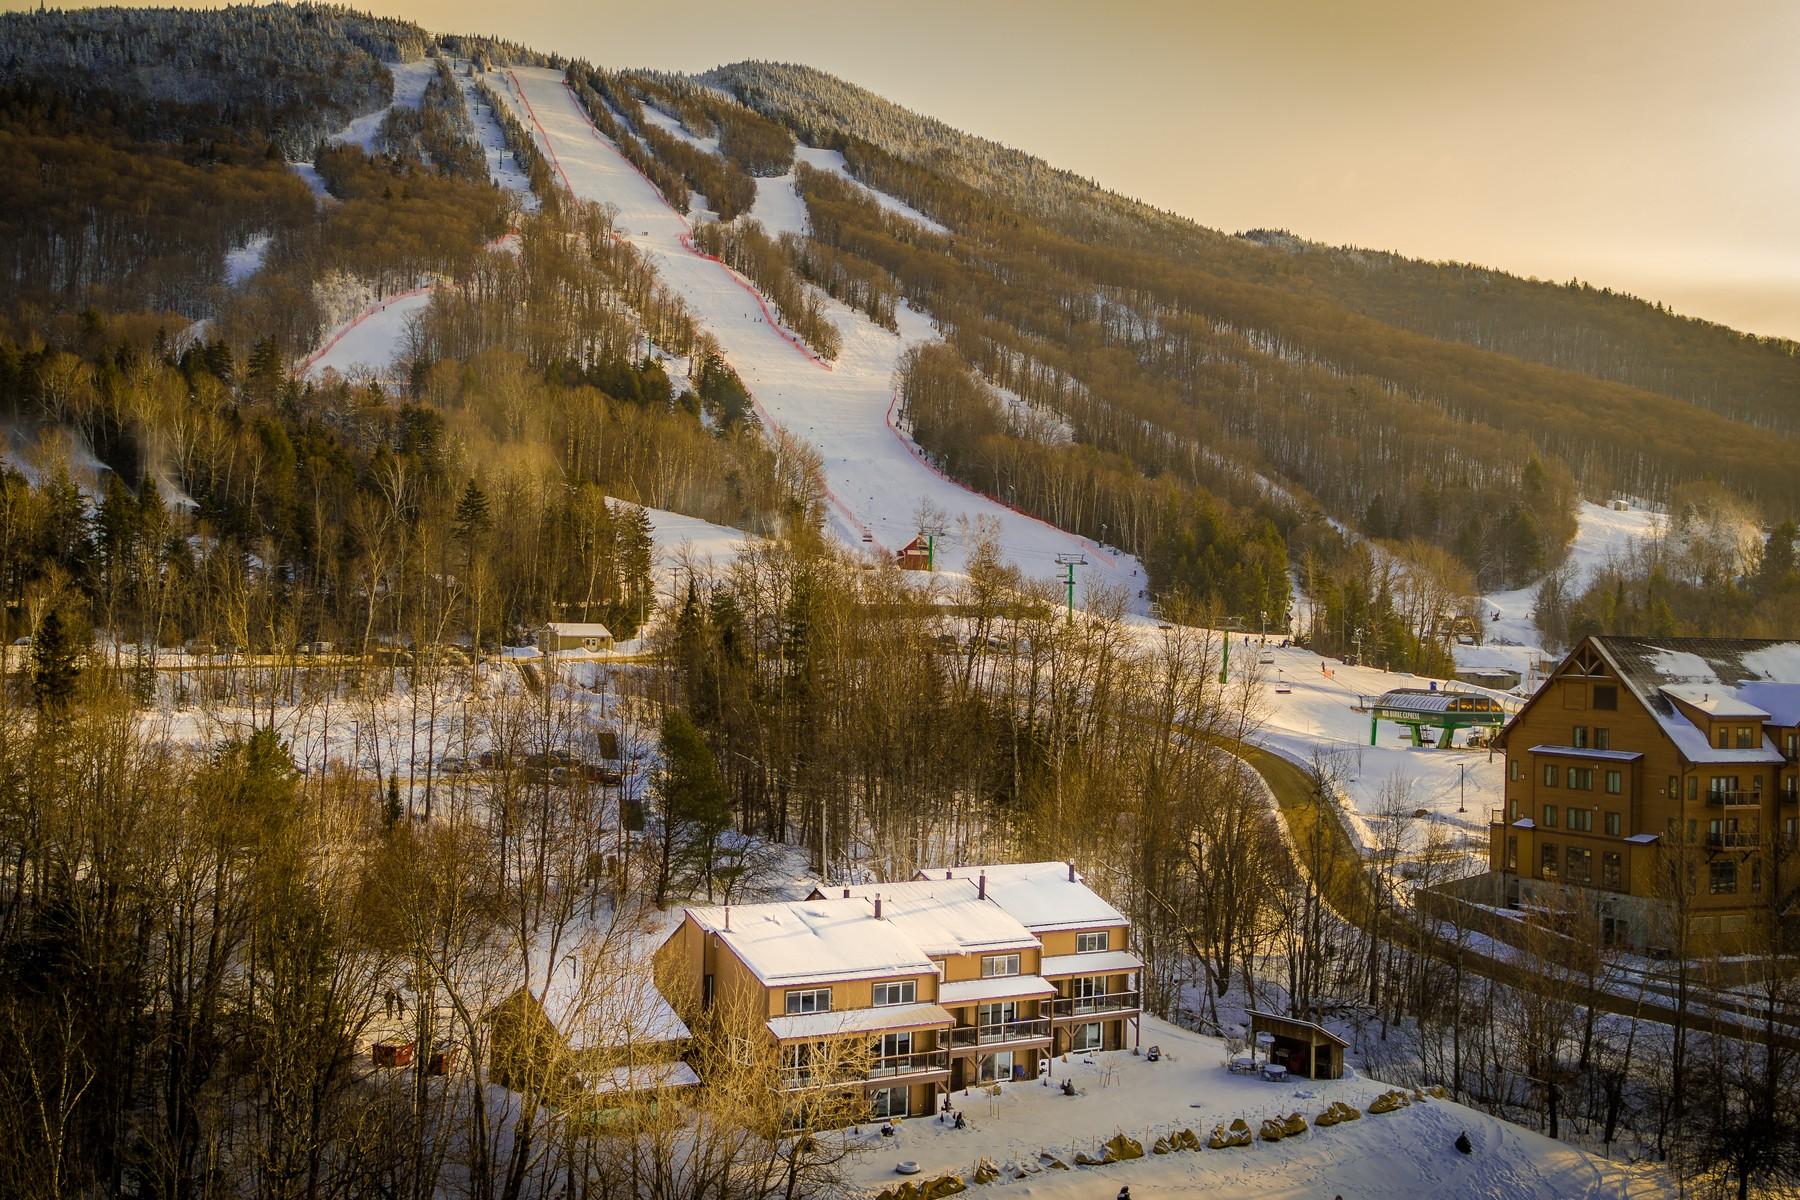 Condominium for Sale at Burke Mountain Resort Sno-Bear Condominium 2426 Mountain Rd 6 Burke, Vermont 05832 United States